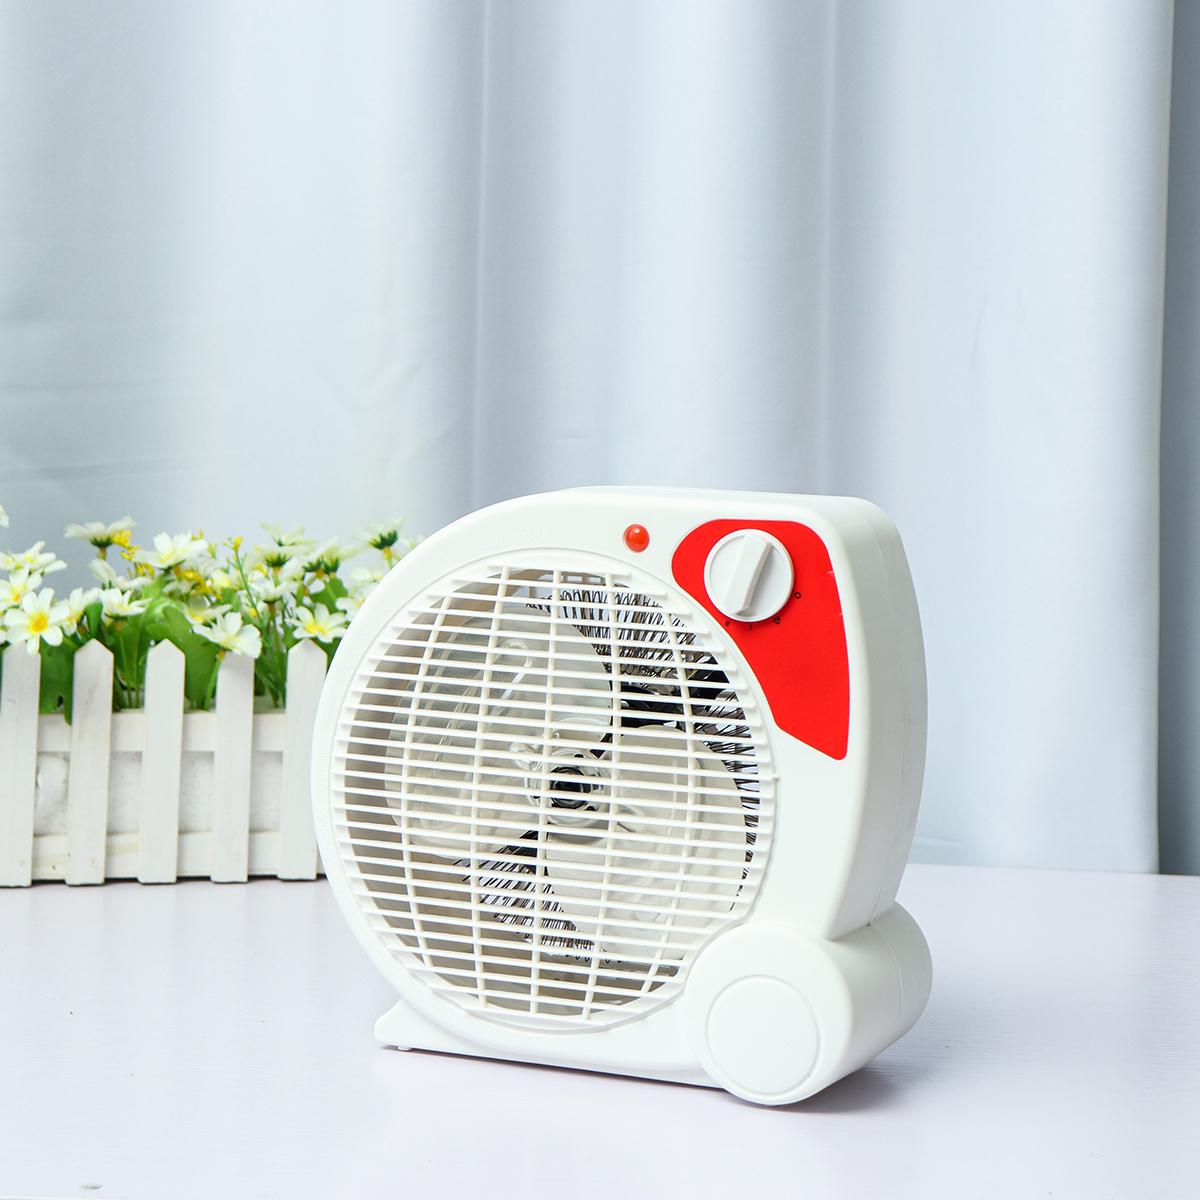 Christmas Cute Mini Electric Heaters Portable Three Heating Settings Air Heating Space Noiseless Winter Warmer 500W Heater